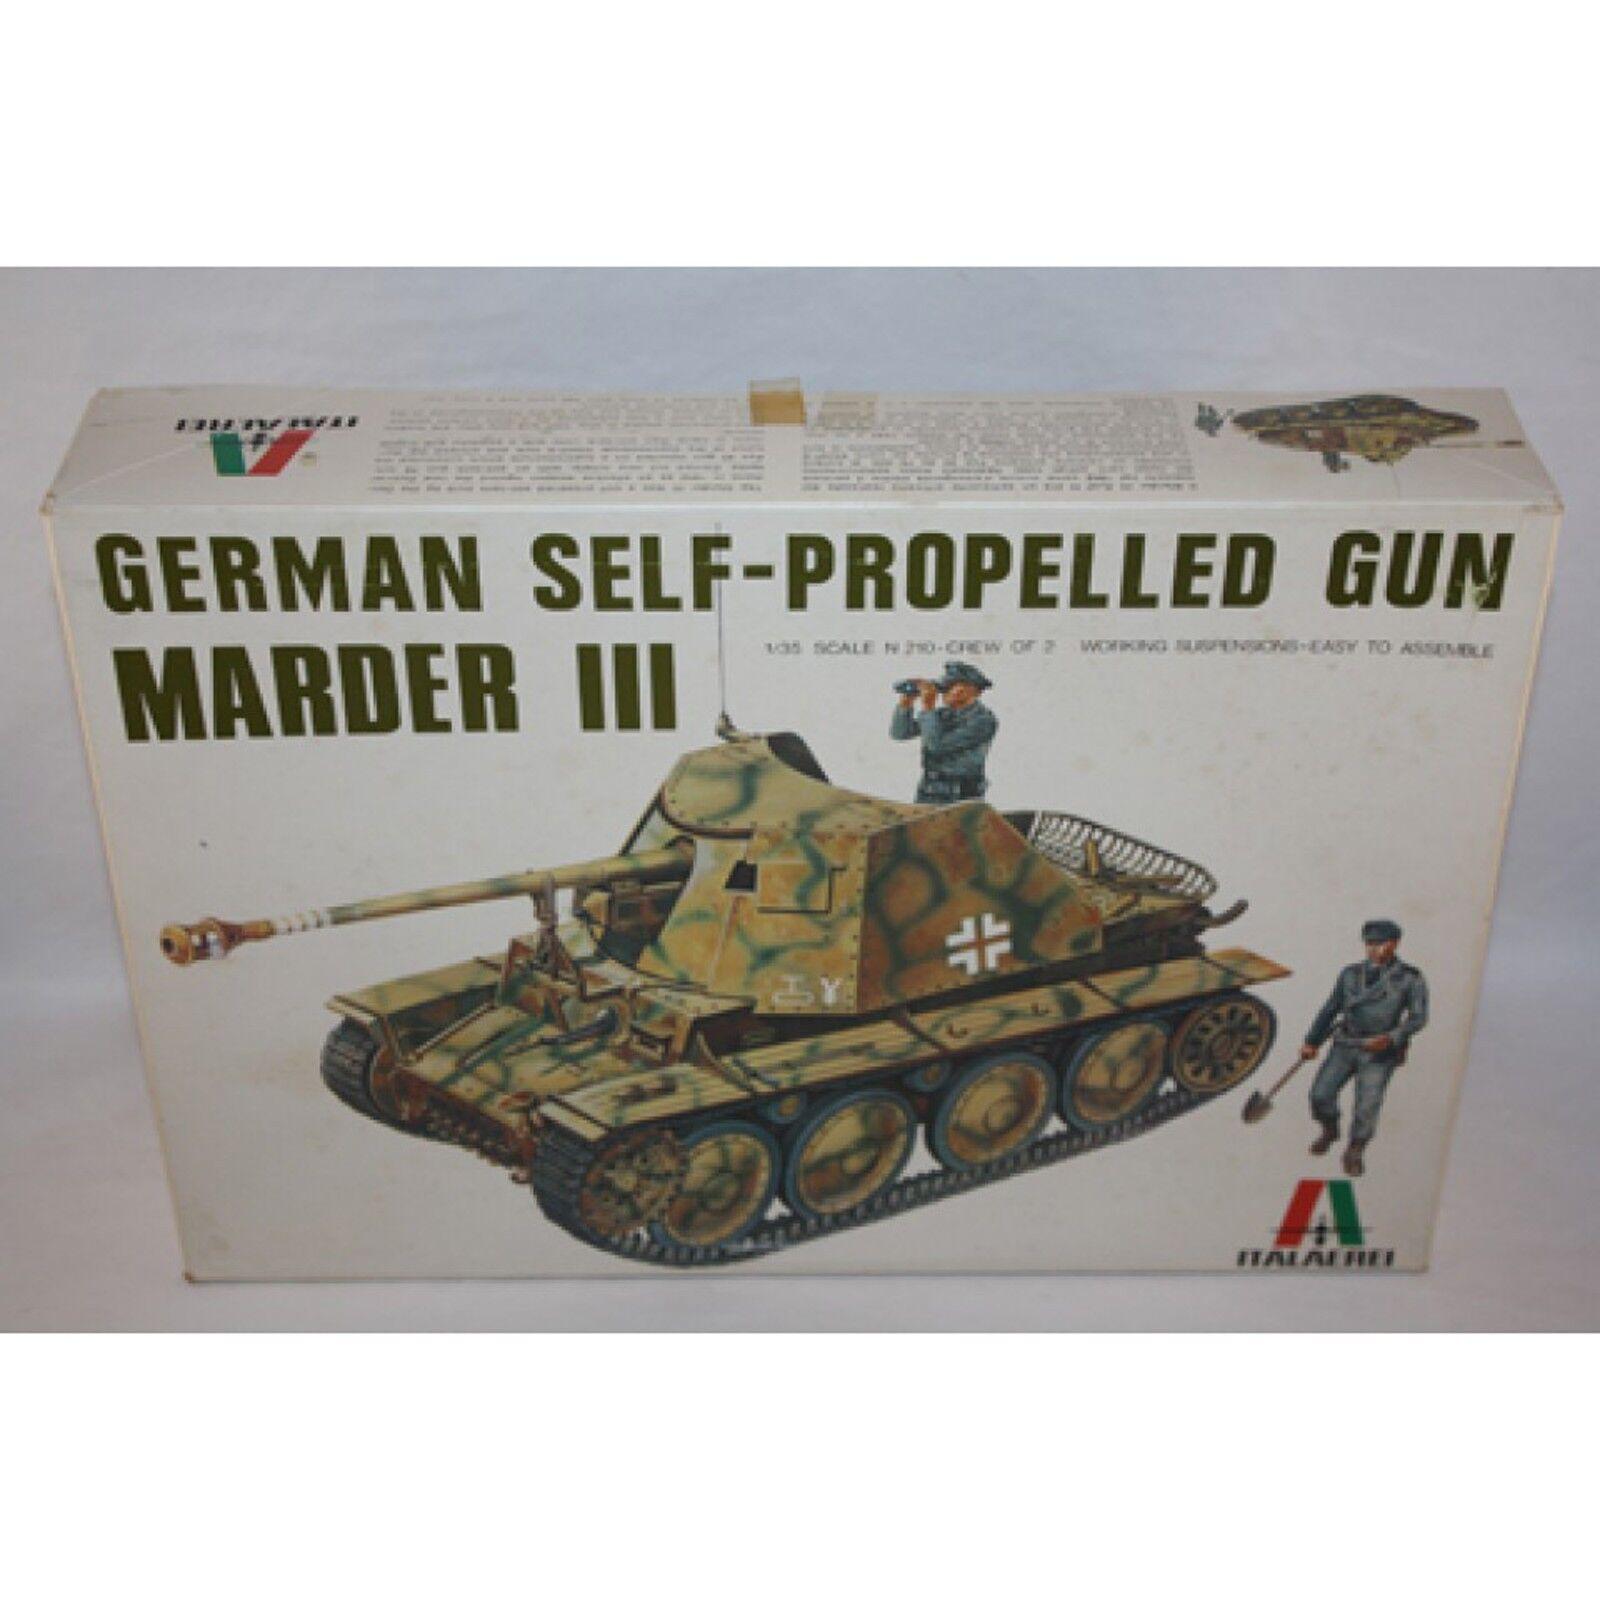 ITALAEREI GERMAN SELF PROPELLED GUN MARDER III PLASTIC MODEL KIT 1 35 SCALE